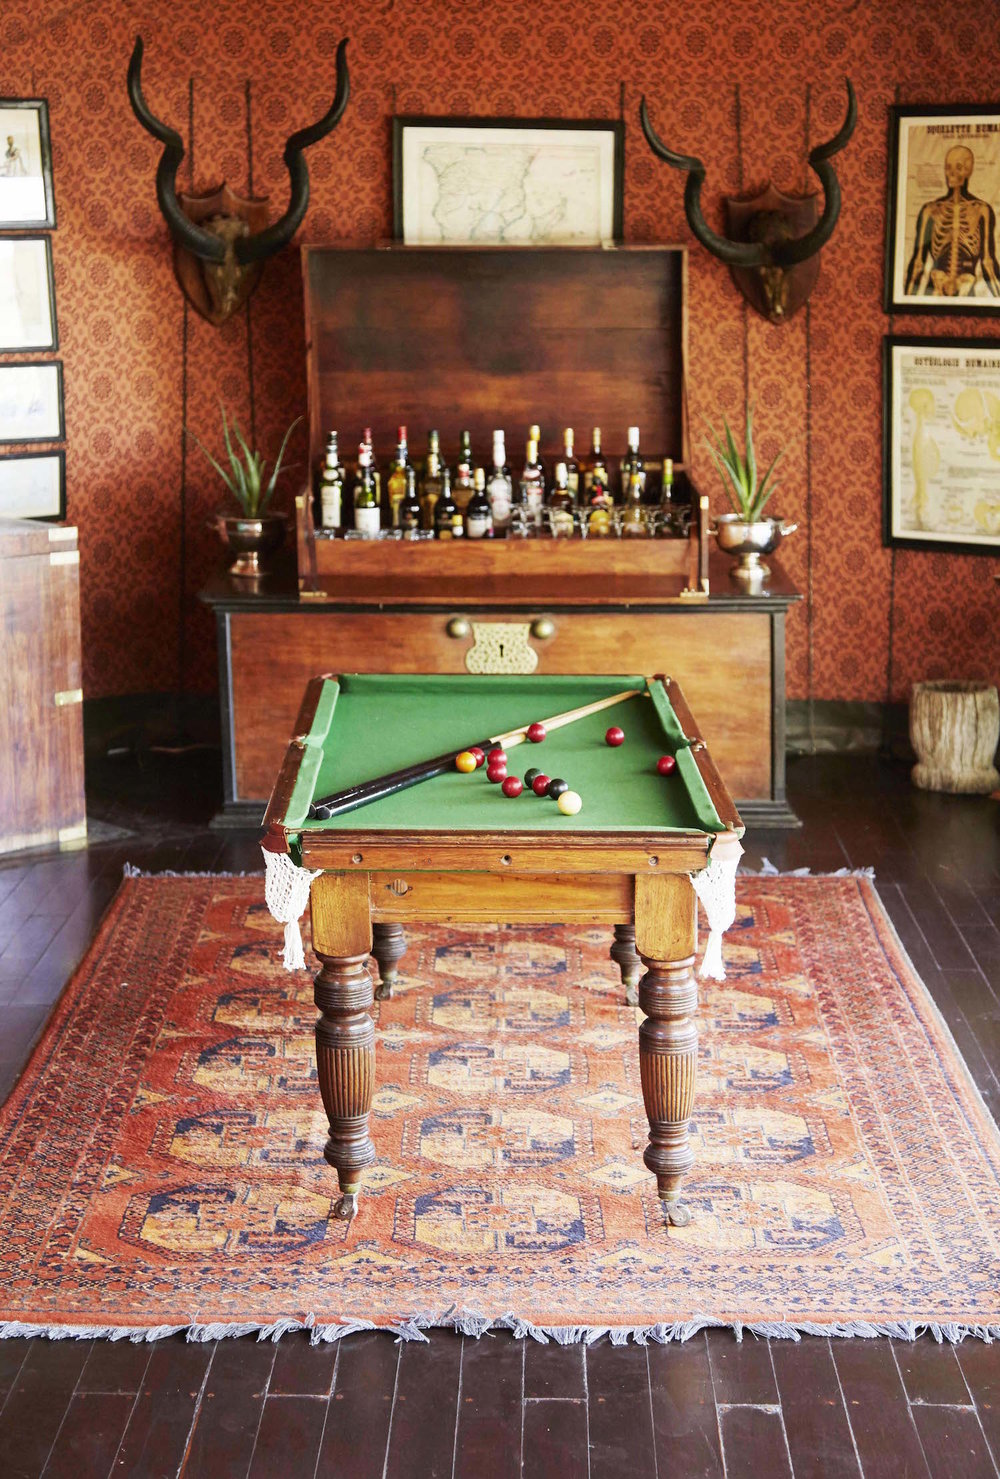 Pool Table & Drinks Chest copy.jpg